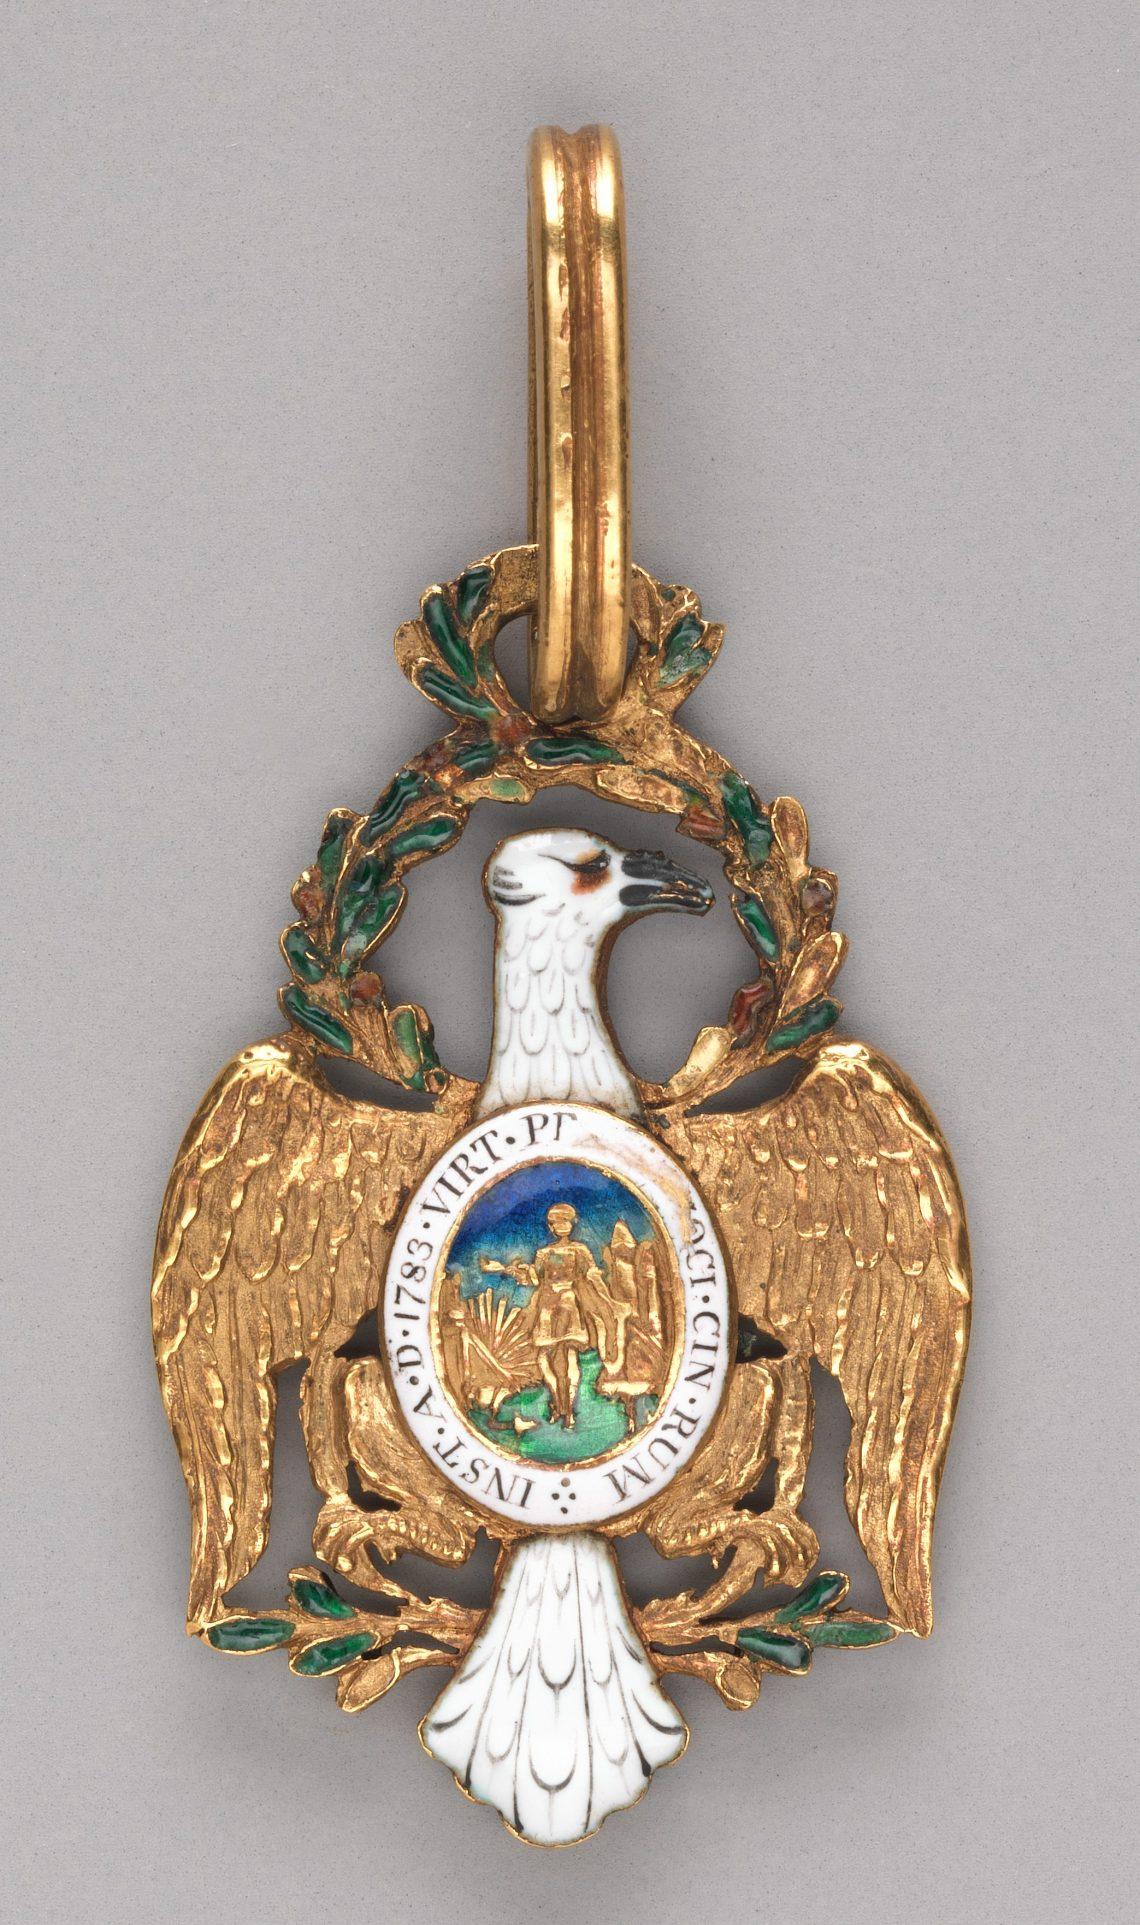 Pierre Charles l'Enfant, badge, circa 1783. Collectie Metropolitan Museum of Art, 35.46a, b. Foto met dank aan Metropolitan Museum of Art©